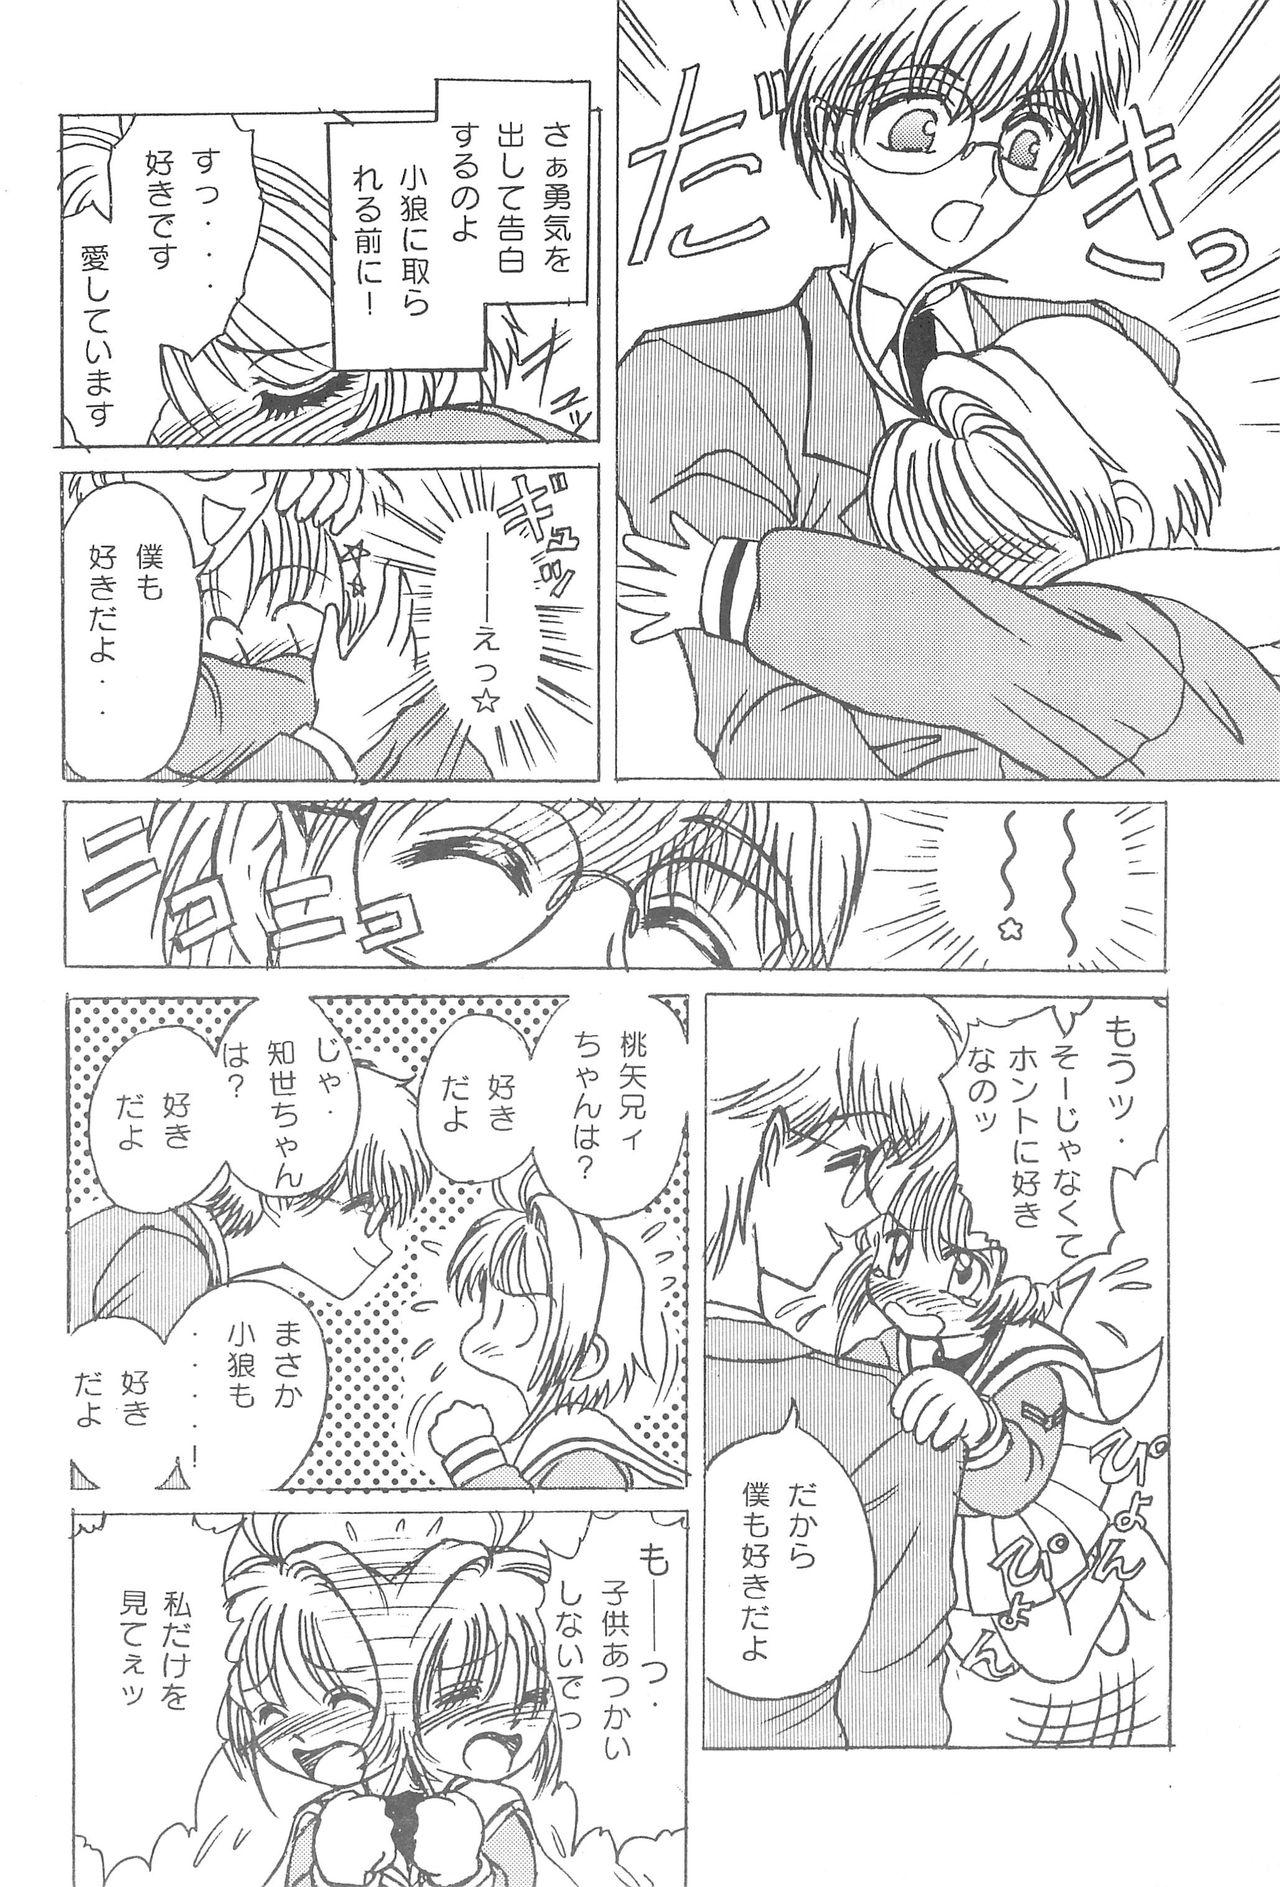 Kero-chan to Issho 5